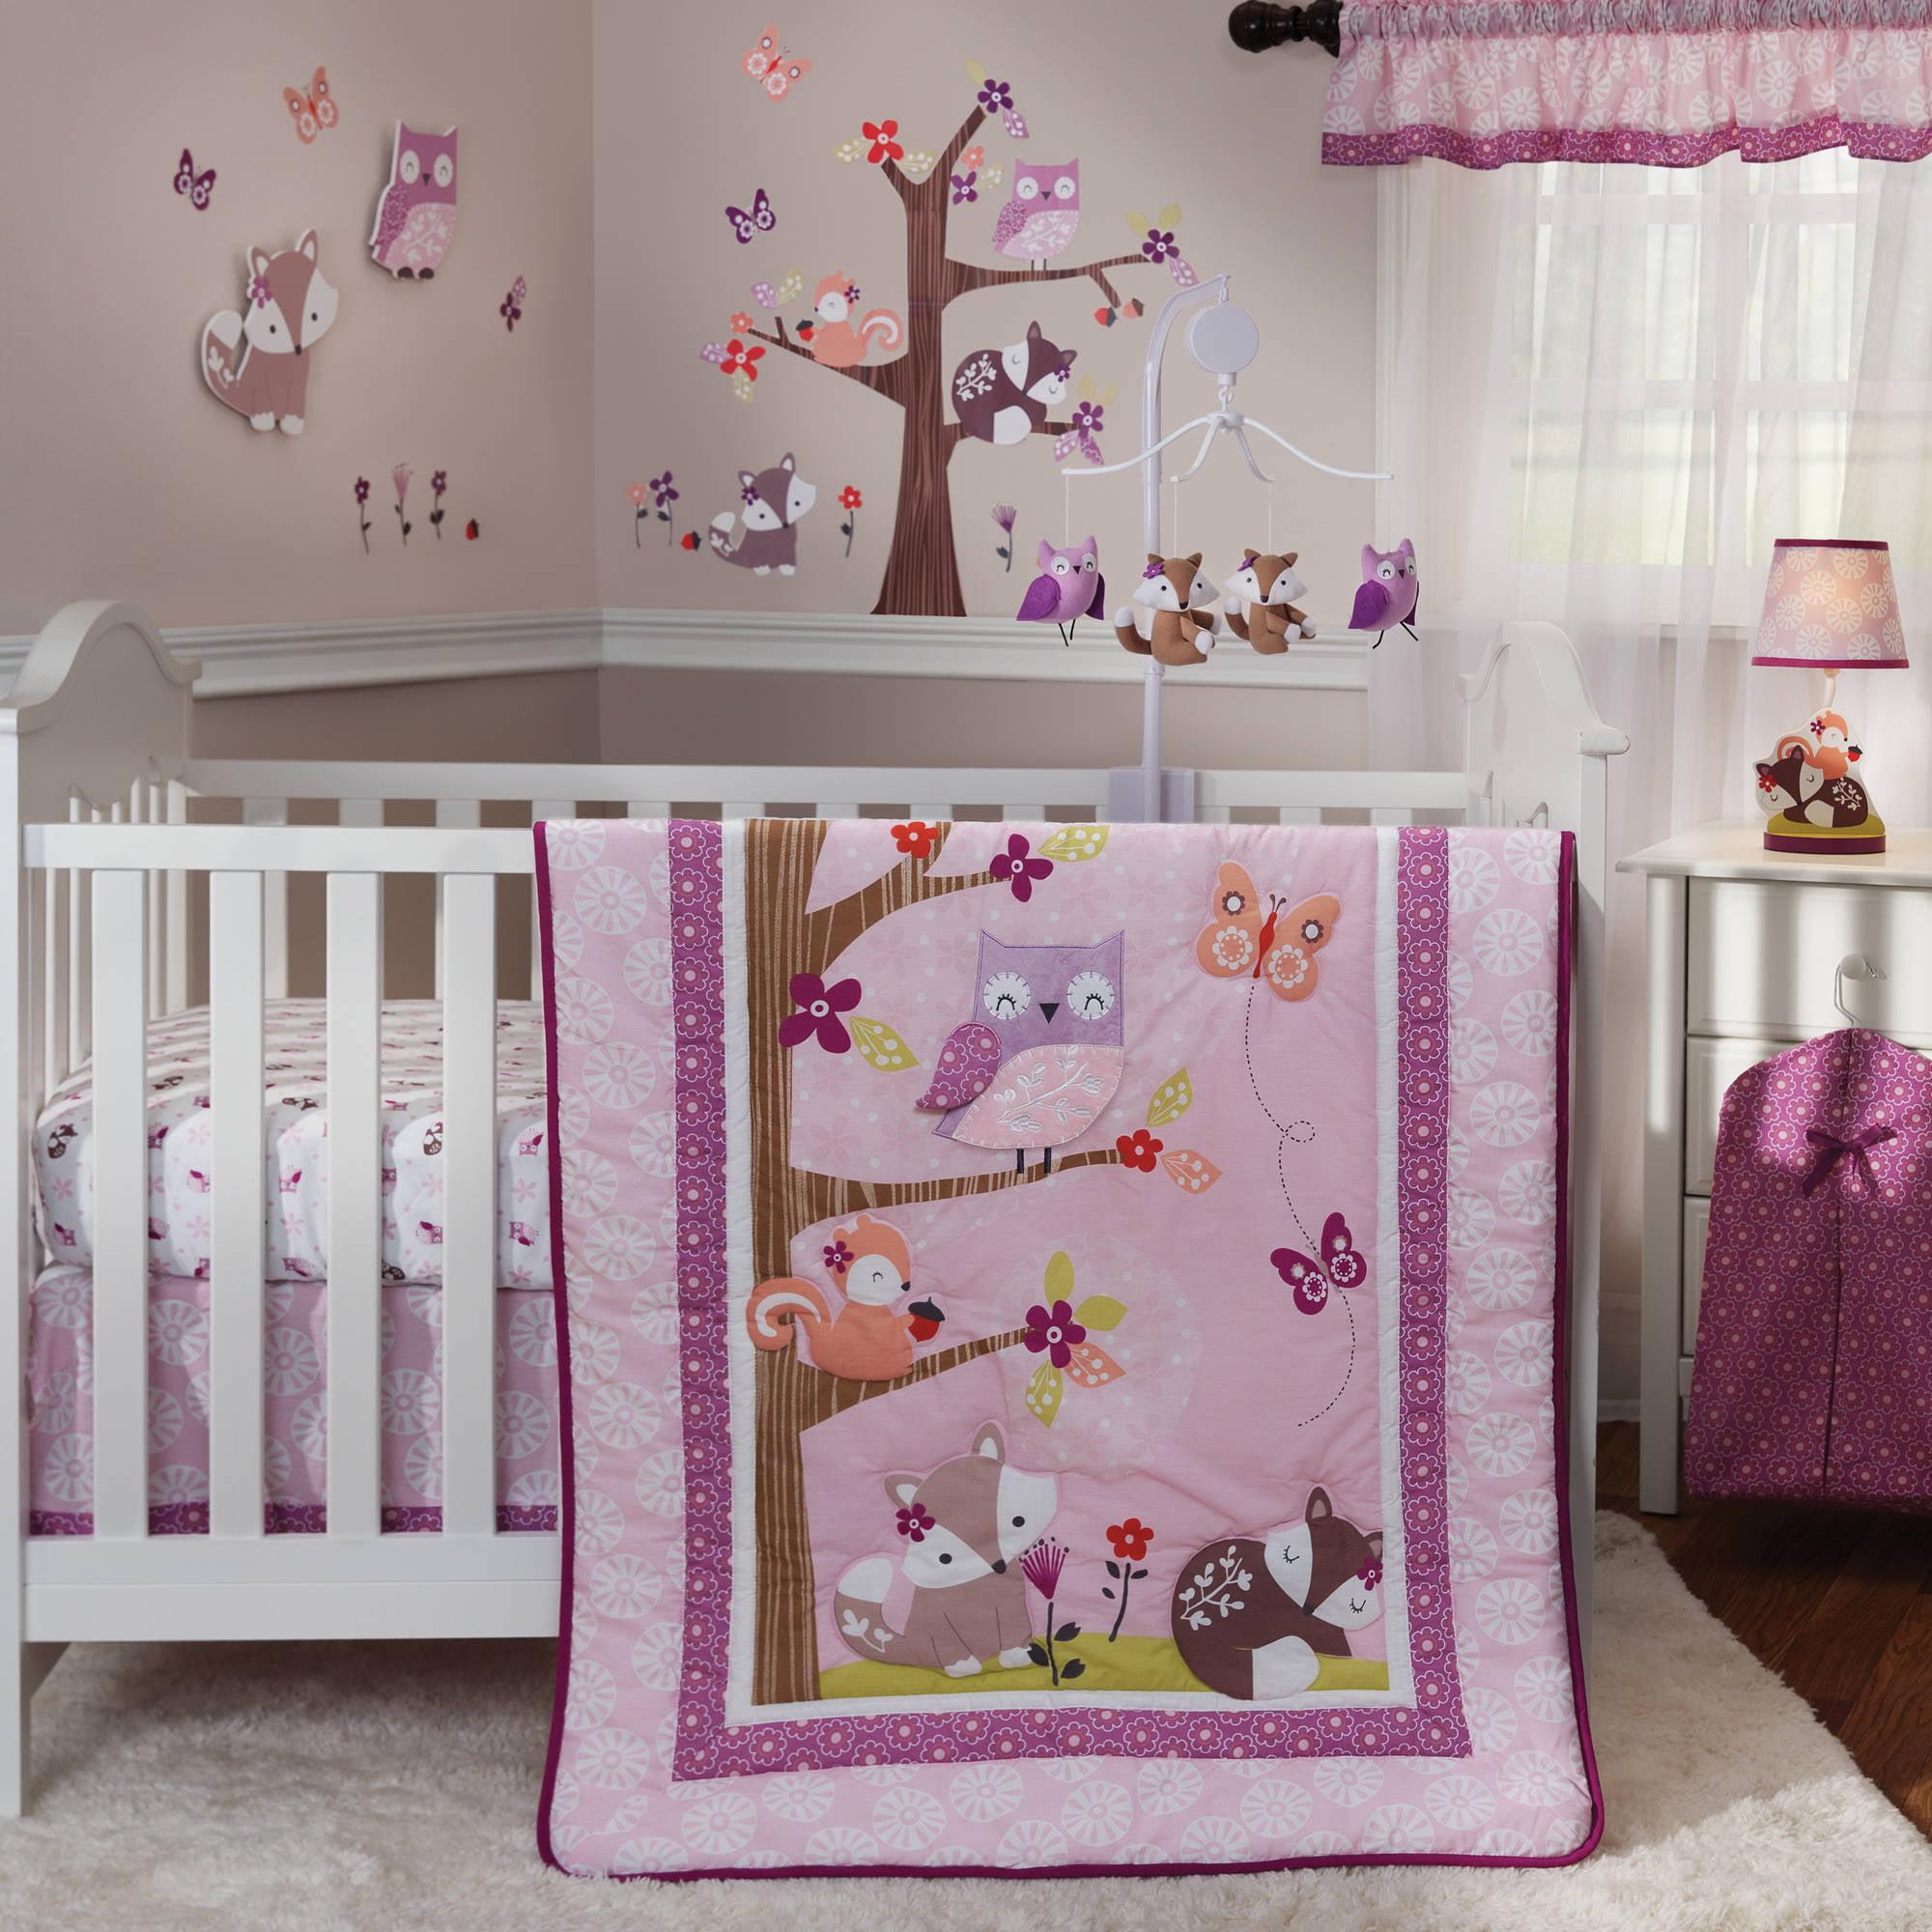 Bedtime Originals Lavender Woods 3-Piece Crib Bedding Set